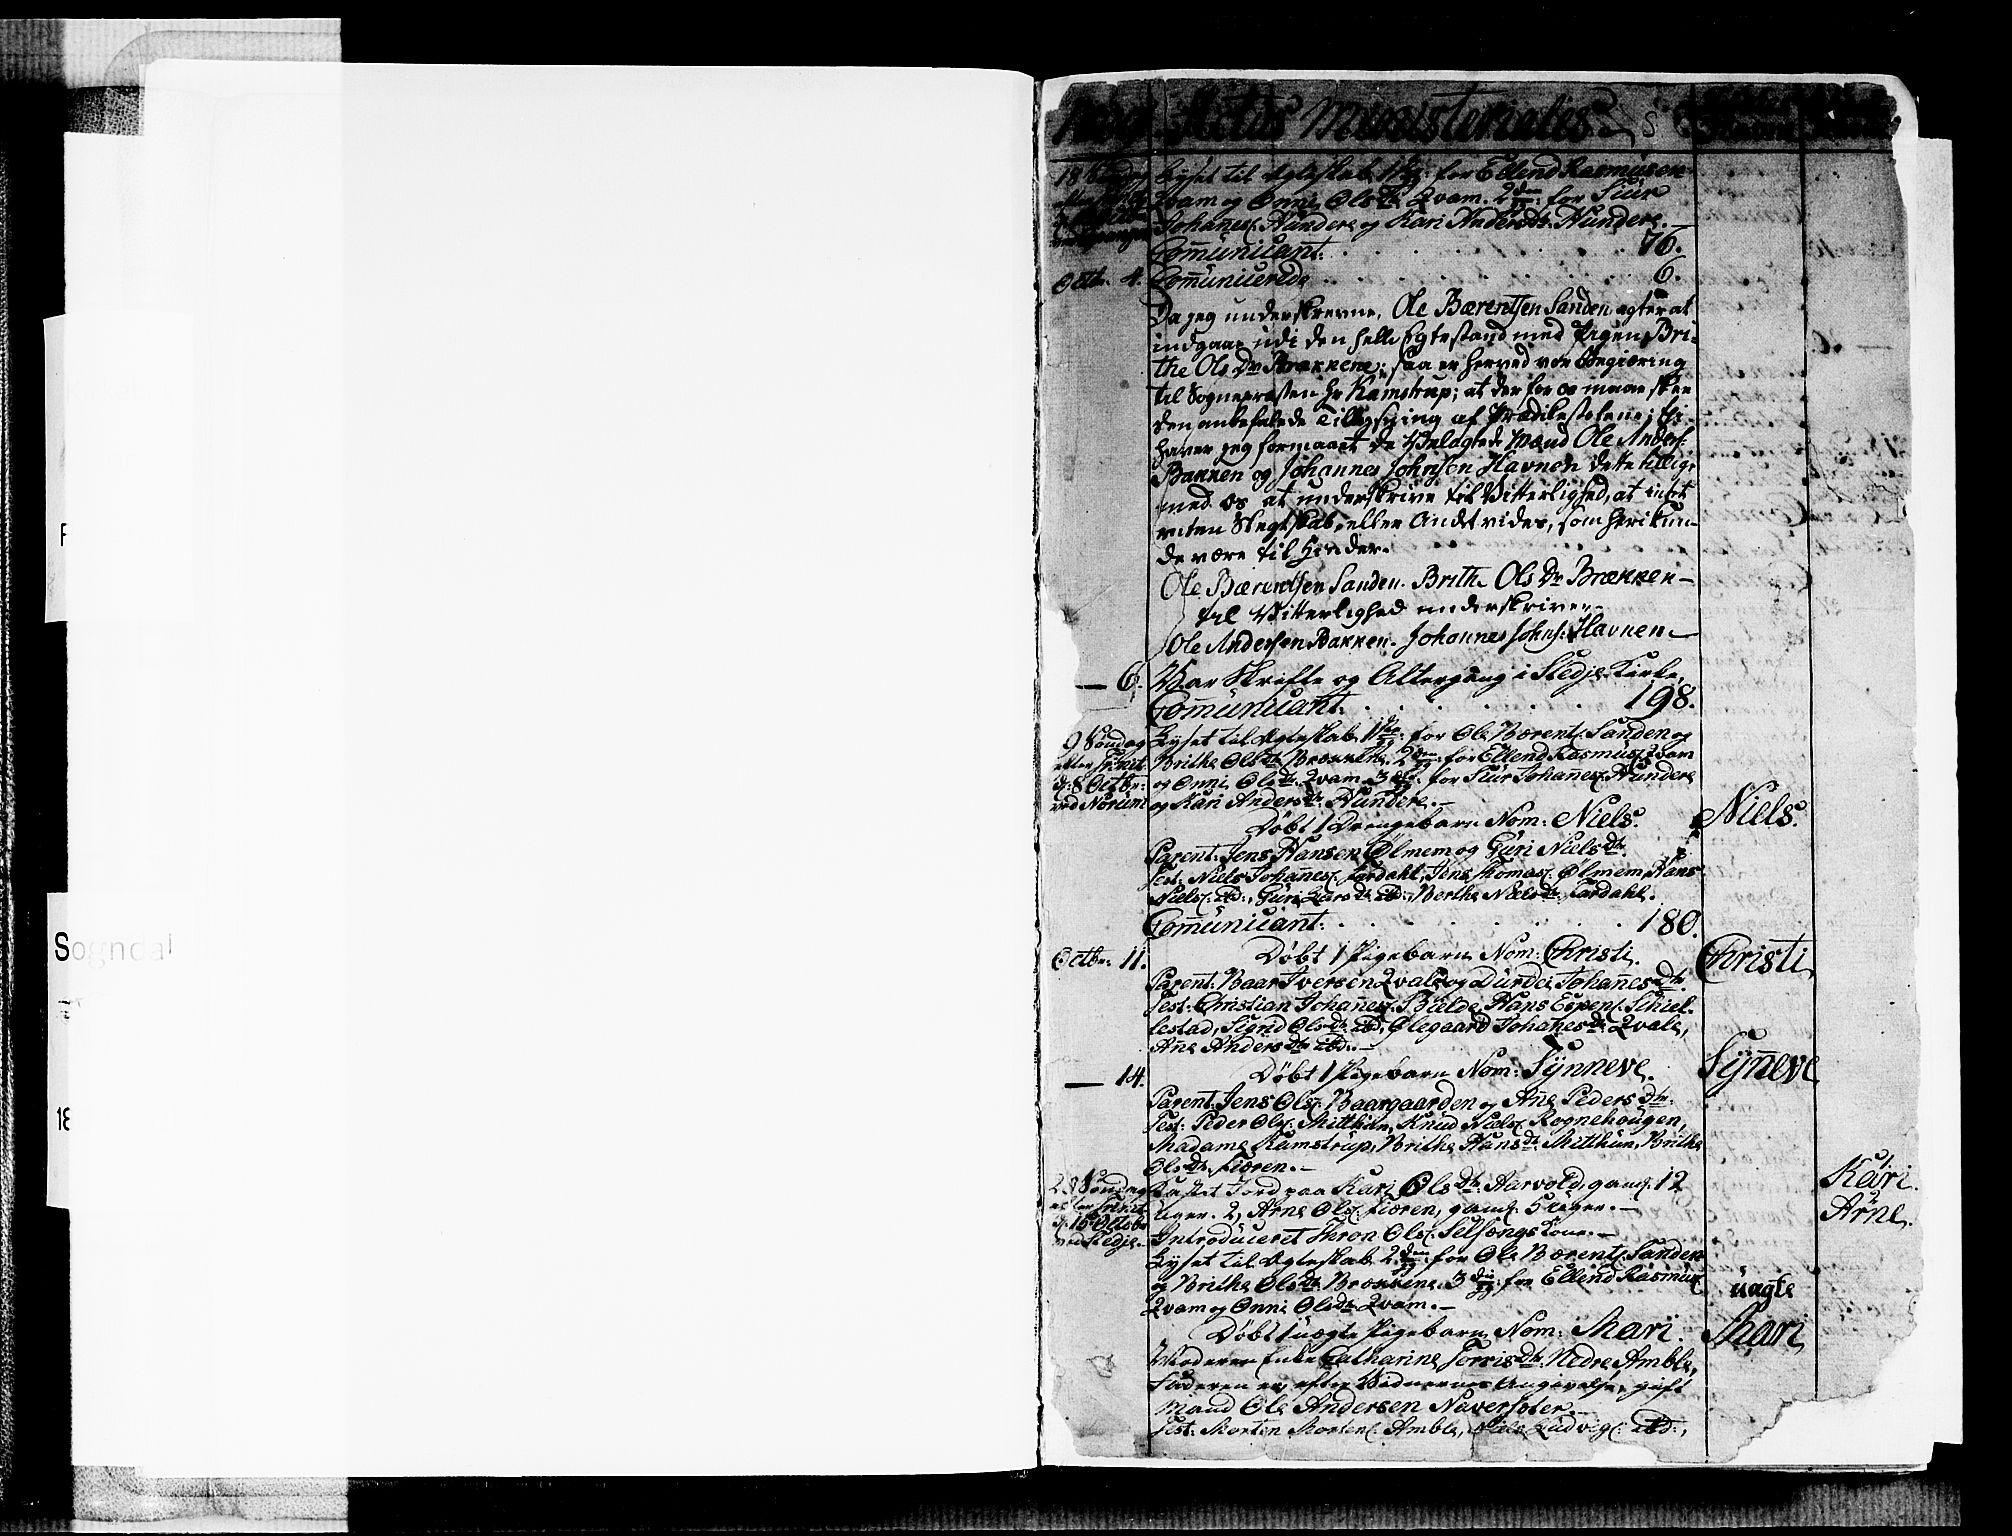 SAB, Sogndal sokneprestembete, H/Haa/Haaa/L0009: Ministerialbok nr. A 9, 1809-1821, s. 2